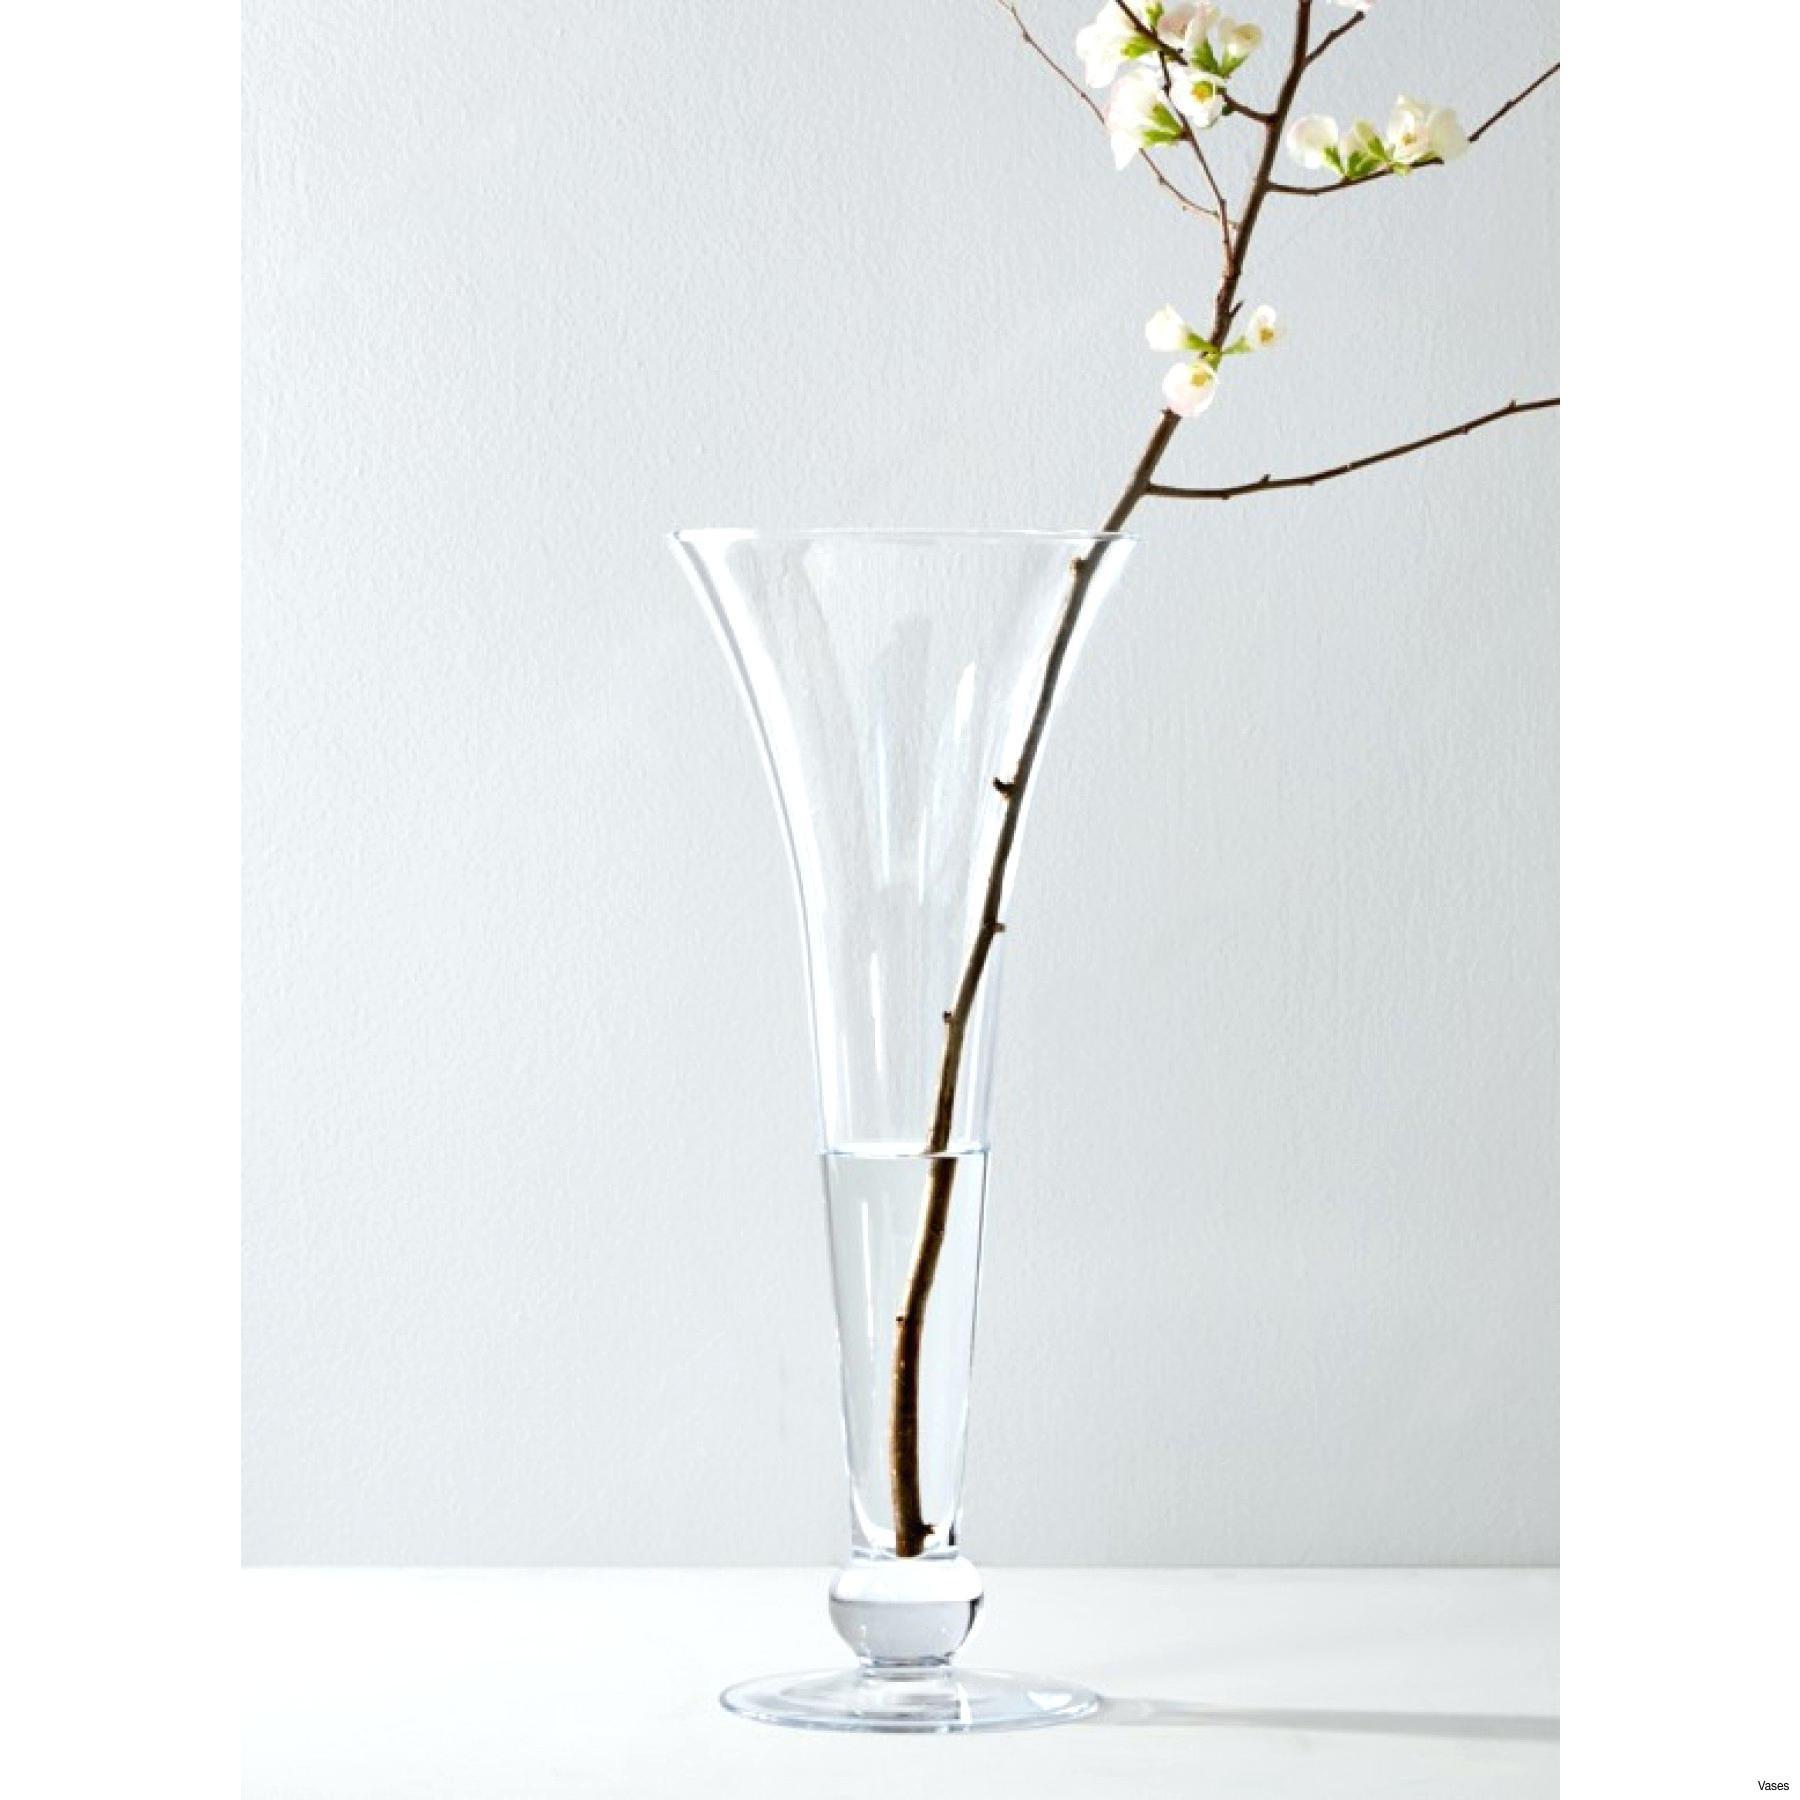 murano glass tall vase of 15 elegant glass trumpet vase bogekompresorturkiye com pertaining to plastic trumpet vase bulk centerpieces diy weddingh vases glass for inspiration gold centerpieces